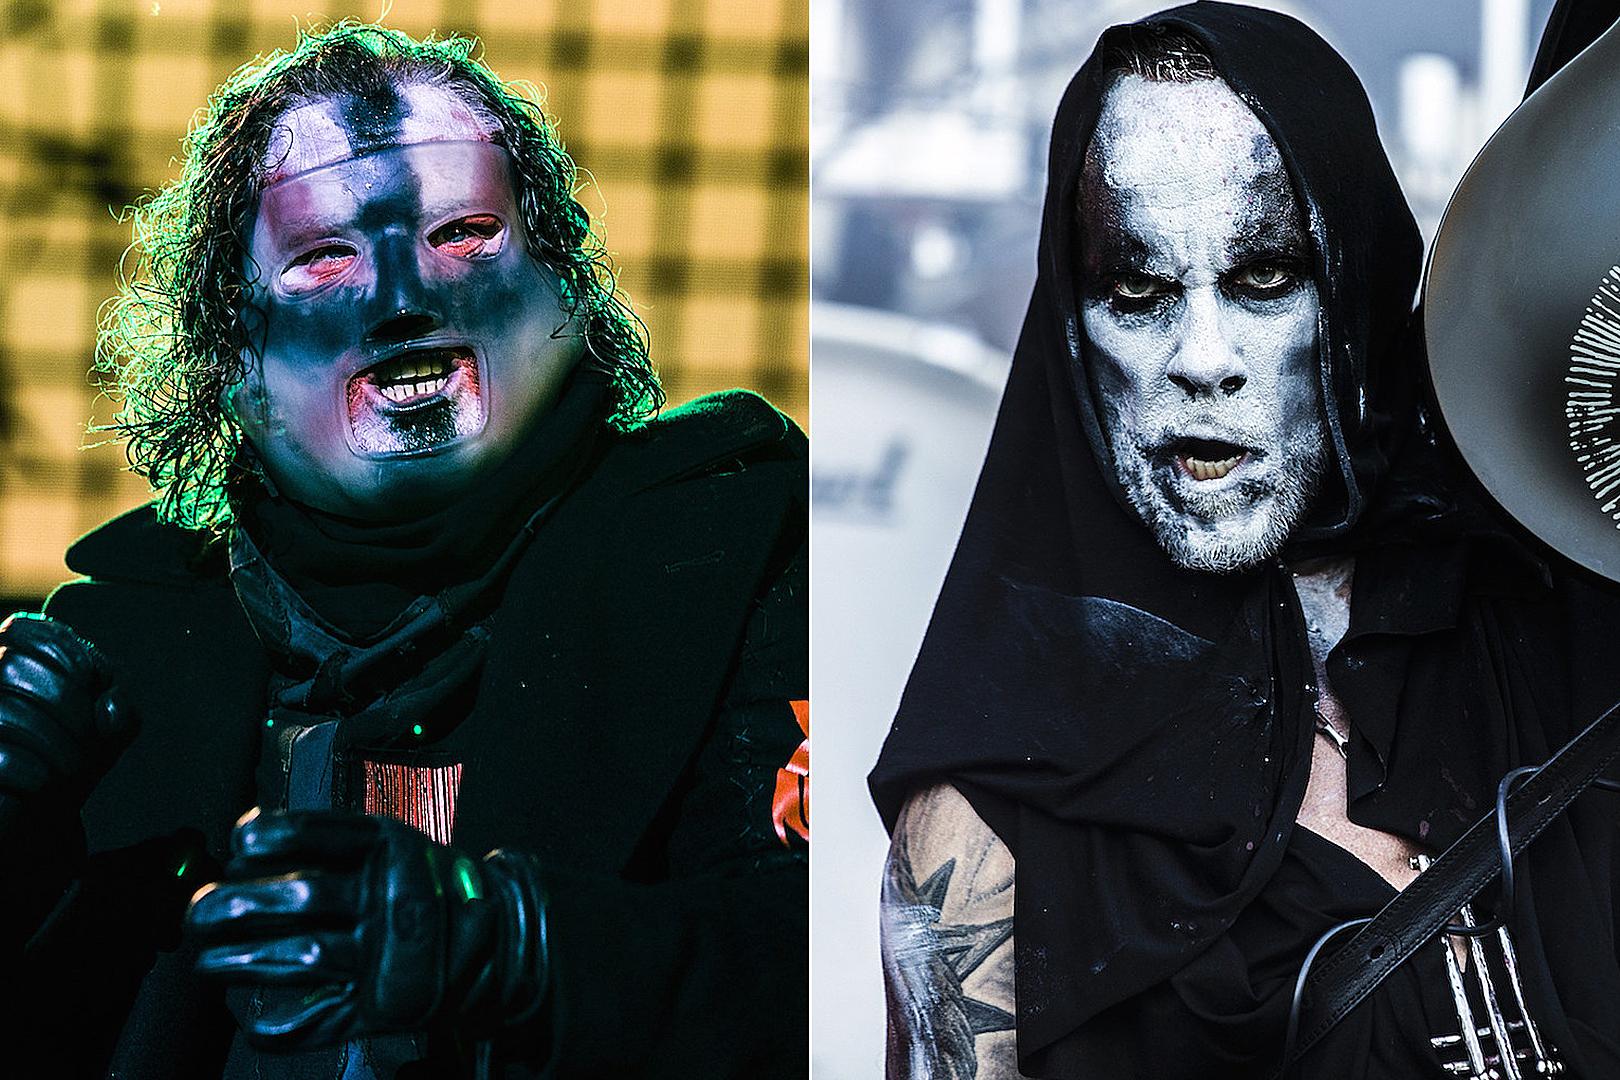 Tech N9ne Tour 2020.Slipknot Announce 2020 Tour With Behemoth